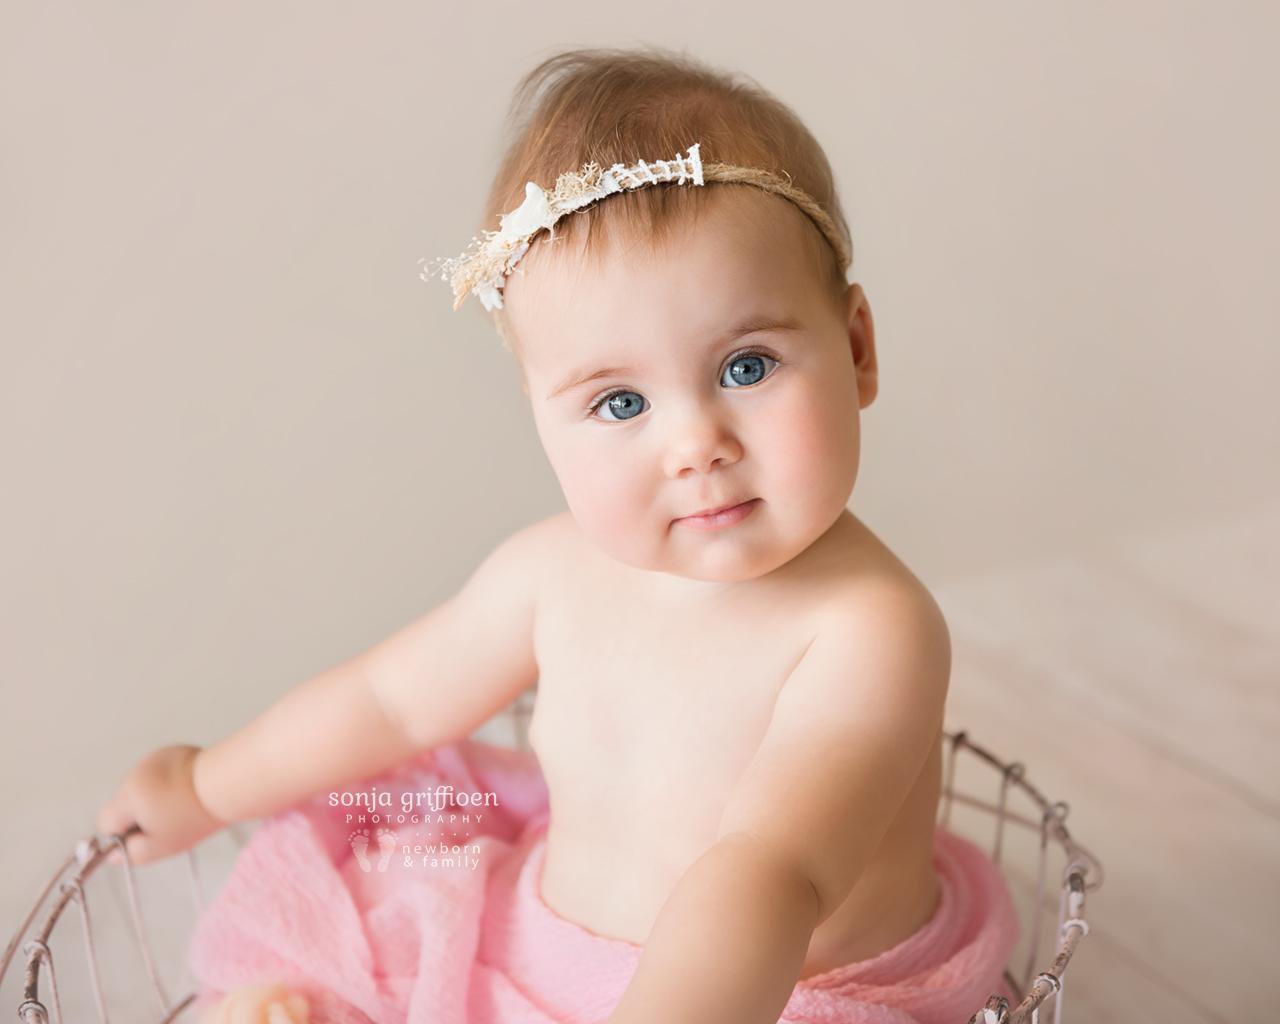 Thalia-Milestone-Brisbane-Newborn-Photographer-Sonja-Griffioen-12.jpg